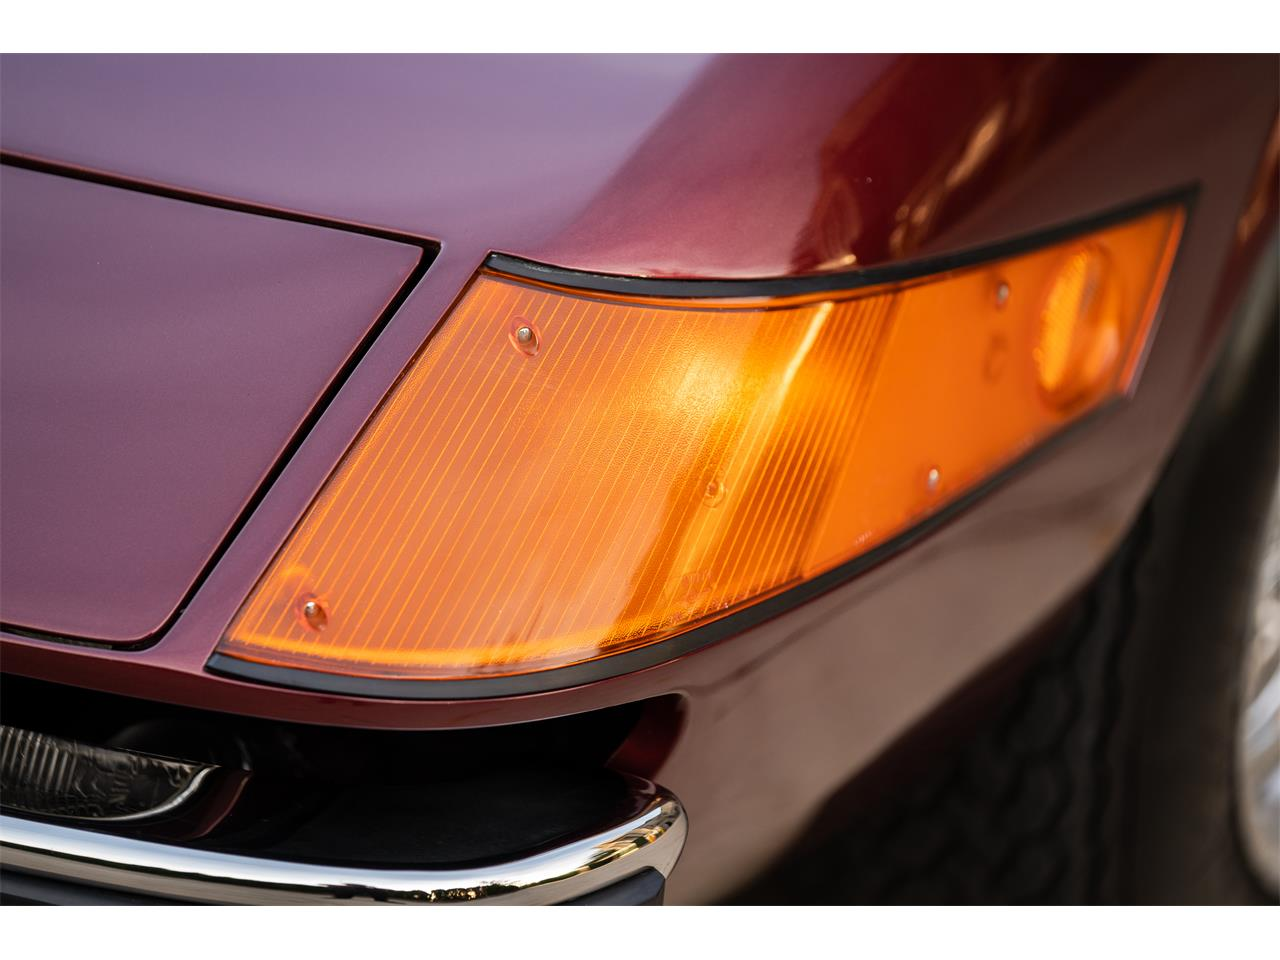 Large Picture of 1972 365 GTB/4 Daytona located in Michigan - $725,000.00 - QL32